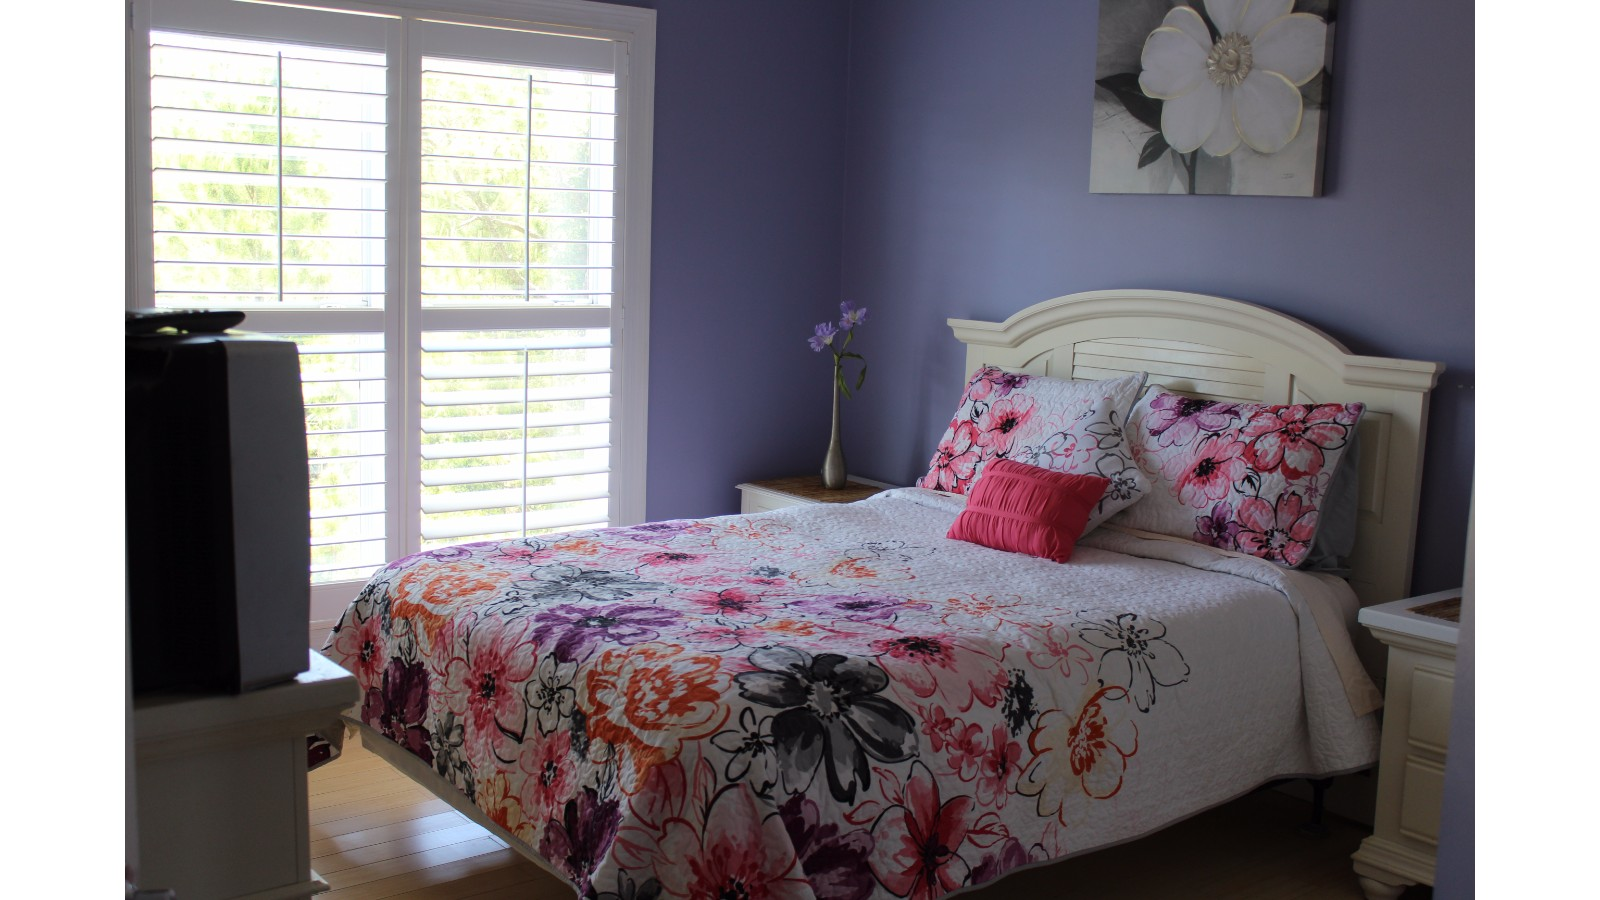 Purple Room, Queen Mattress, Bath Room Attached, Top Floor 1 of 2 Bedrooms , Facing Road, TV and Closet.